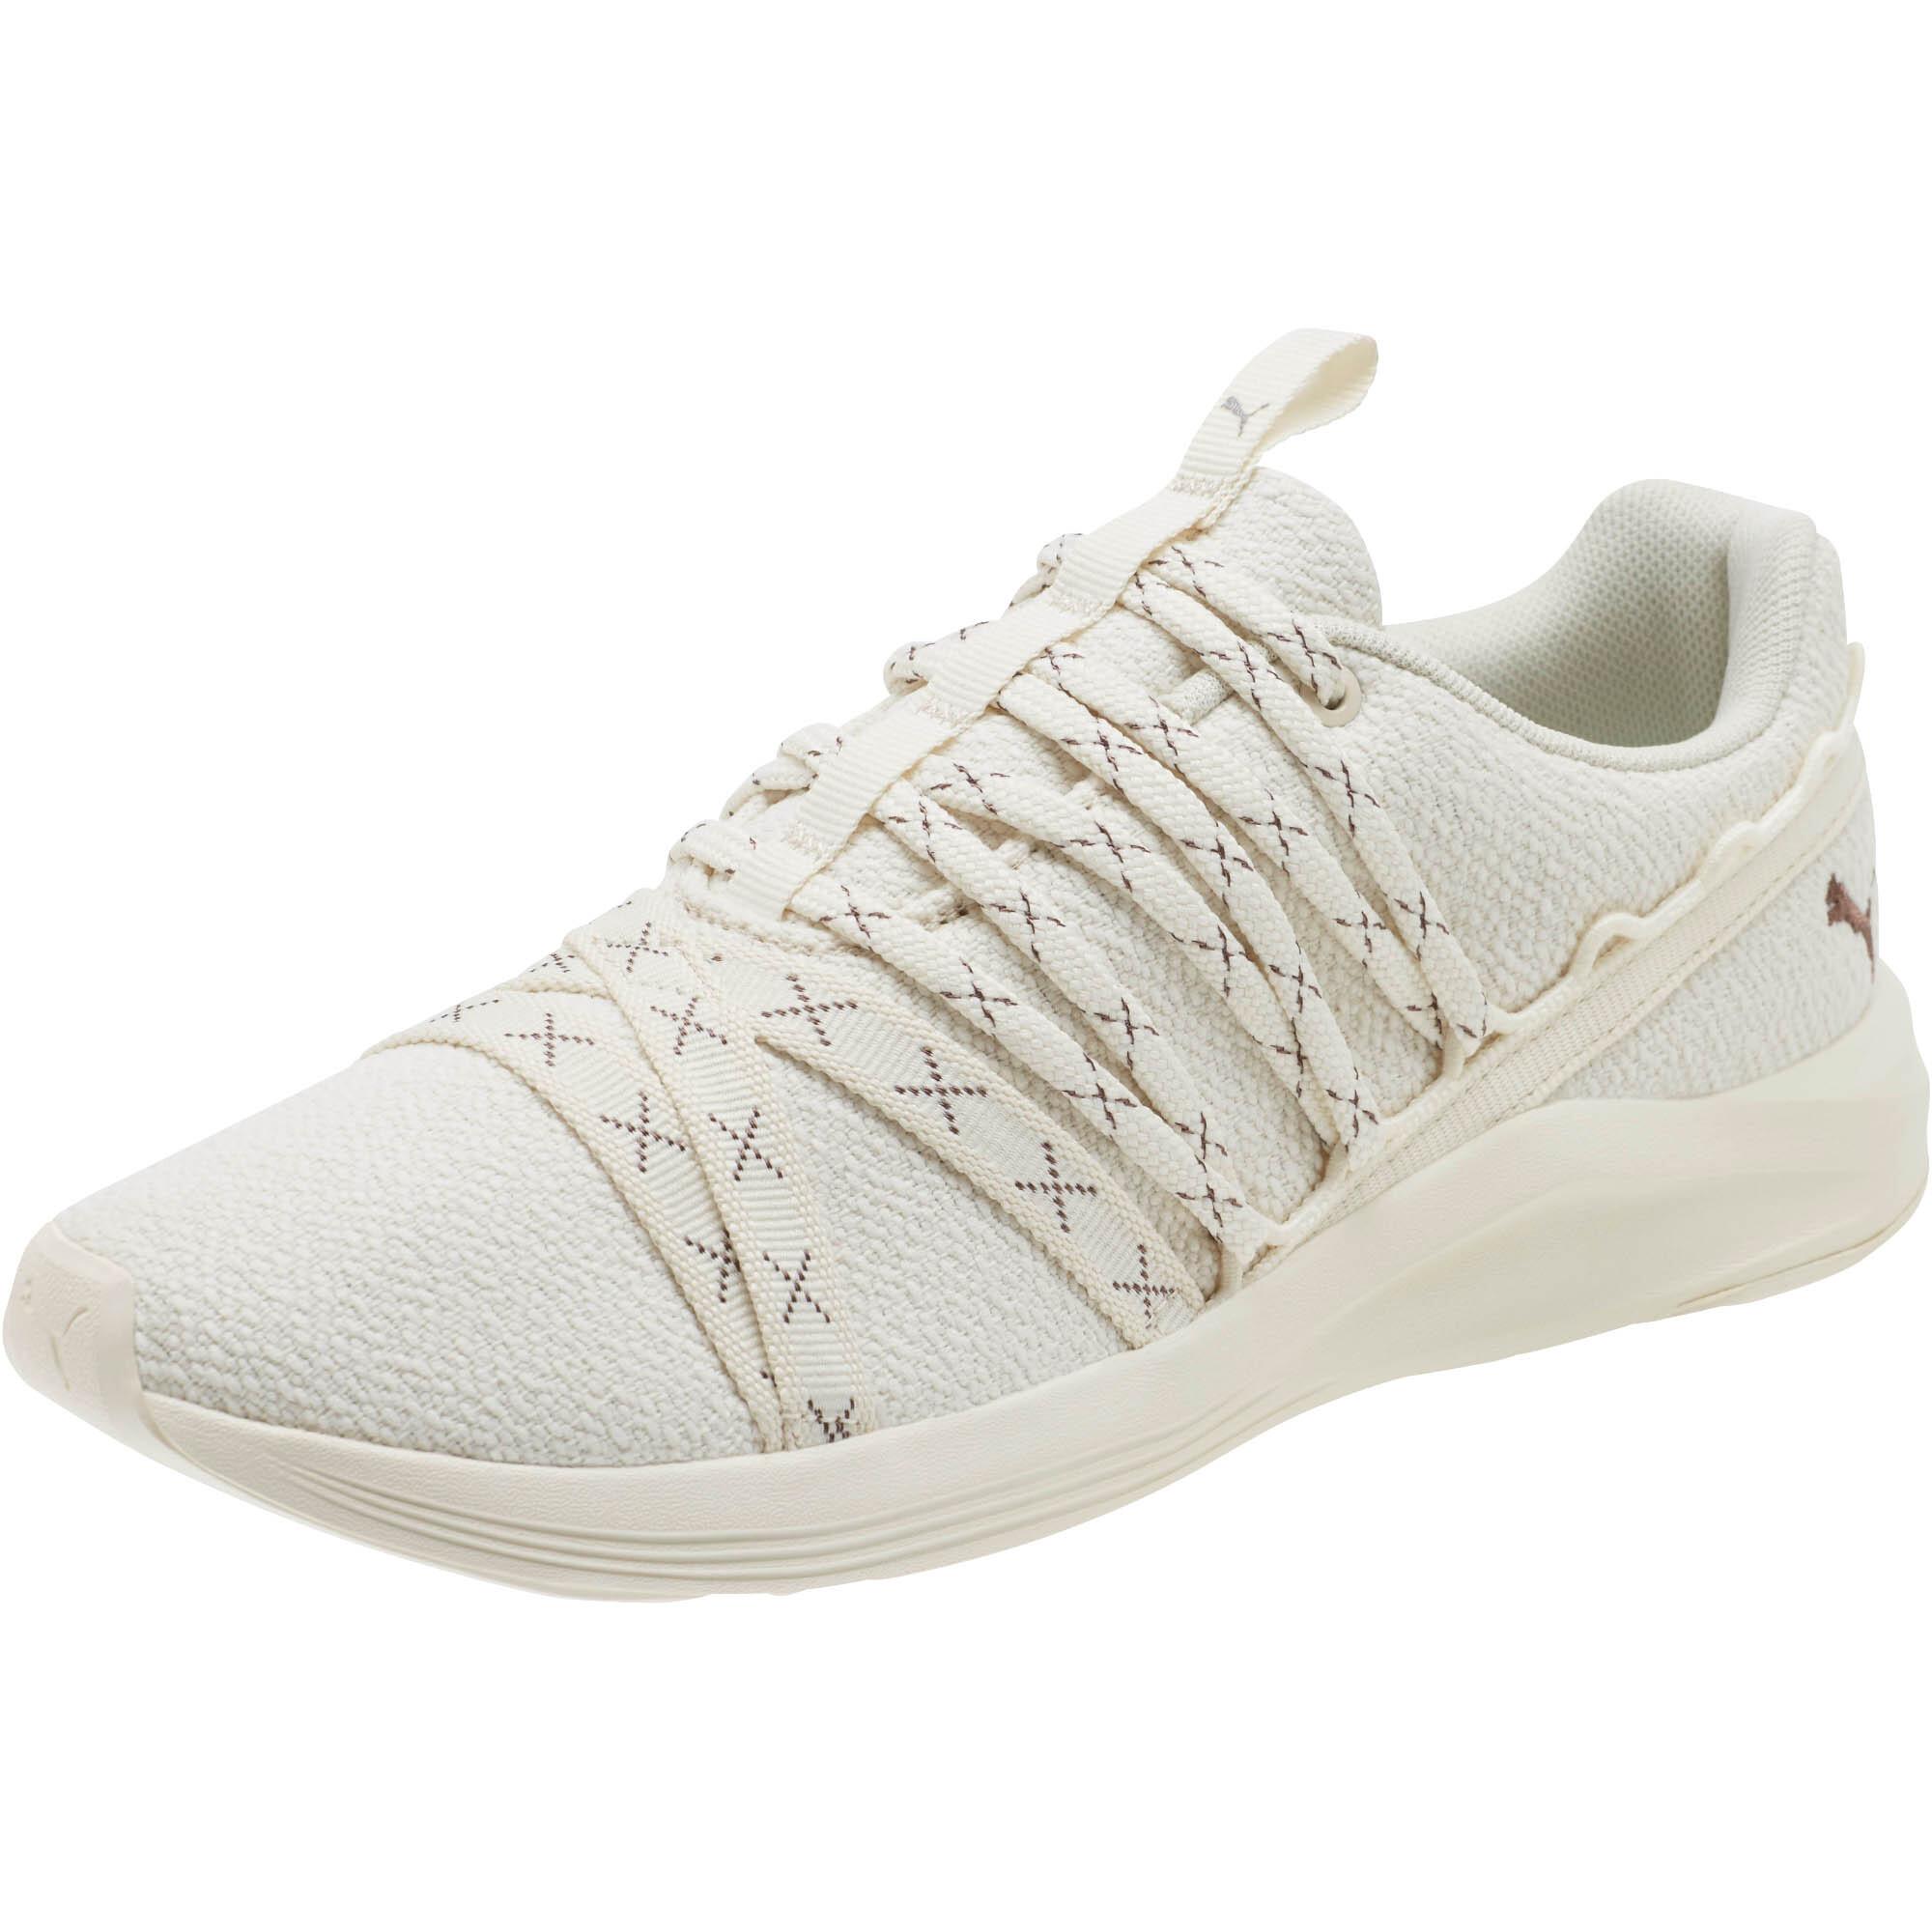 PUMA-Prowl-Alt-2-LX-Women-039-s-Training-Shoes-Women-Shoe-Training thumbnail 10